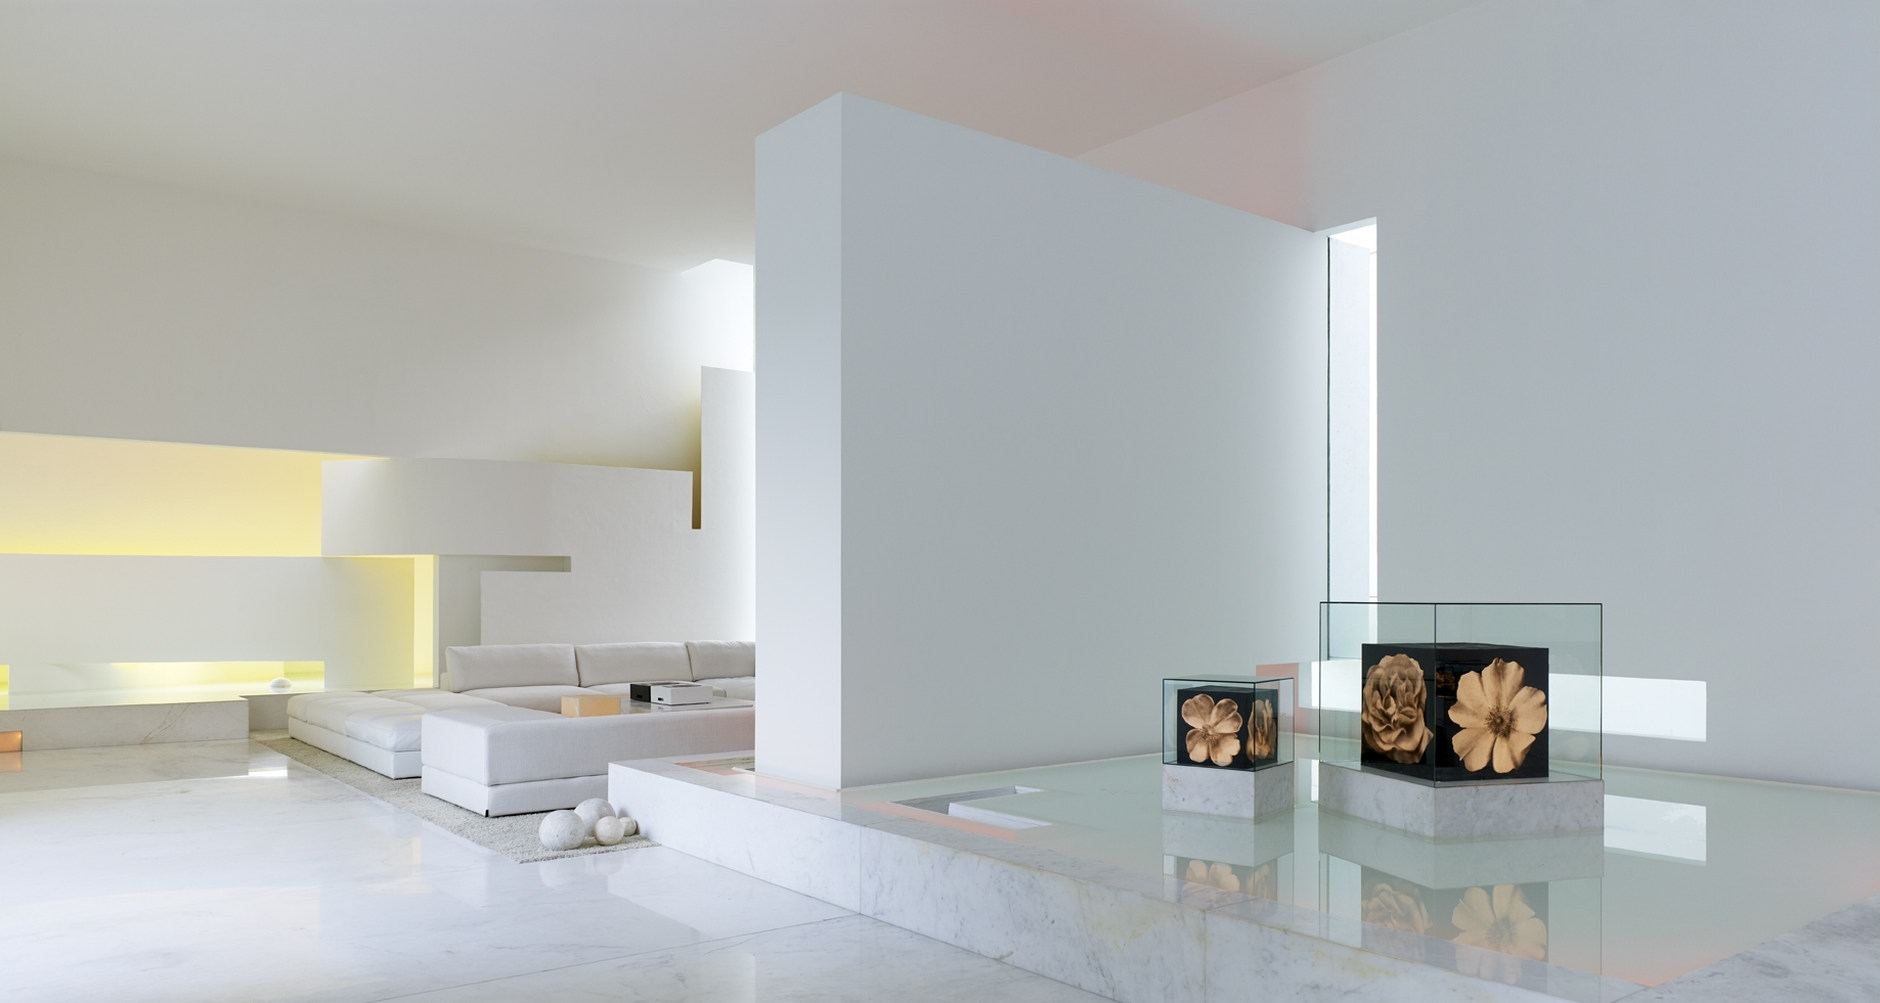 tecas 43 by miguel angel aragon s karmatrendz. Black Bedroom Furniture Sets. Home Design Ideas